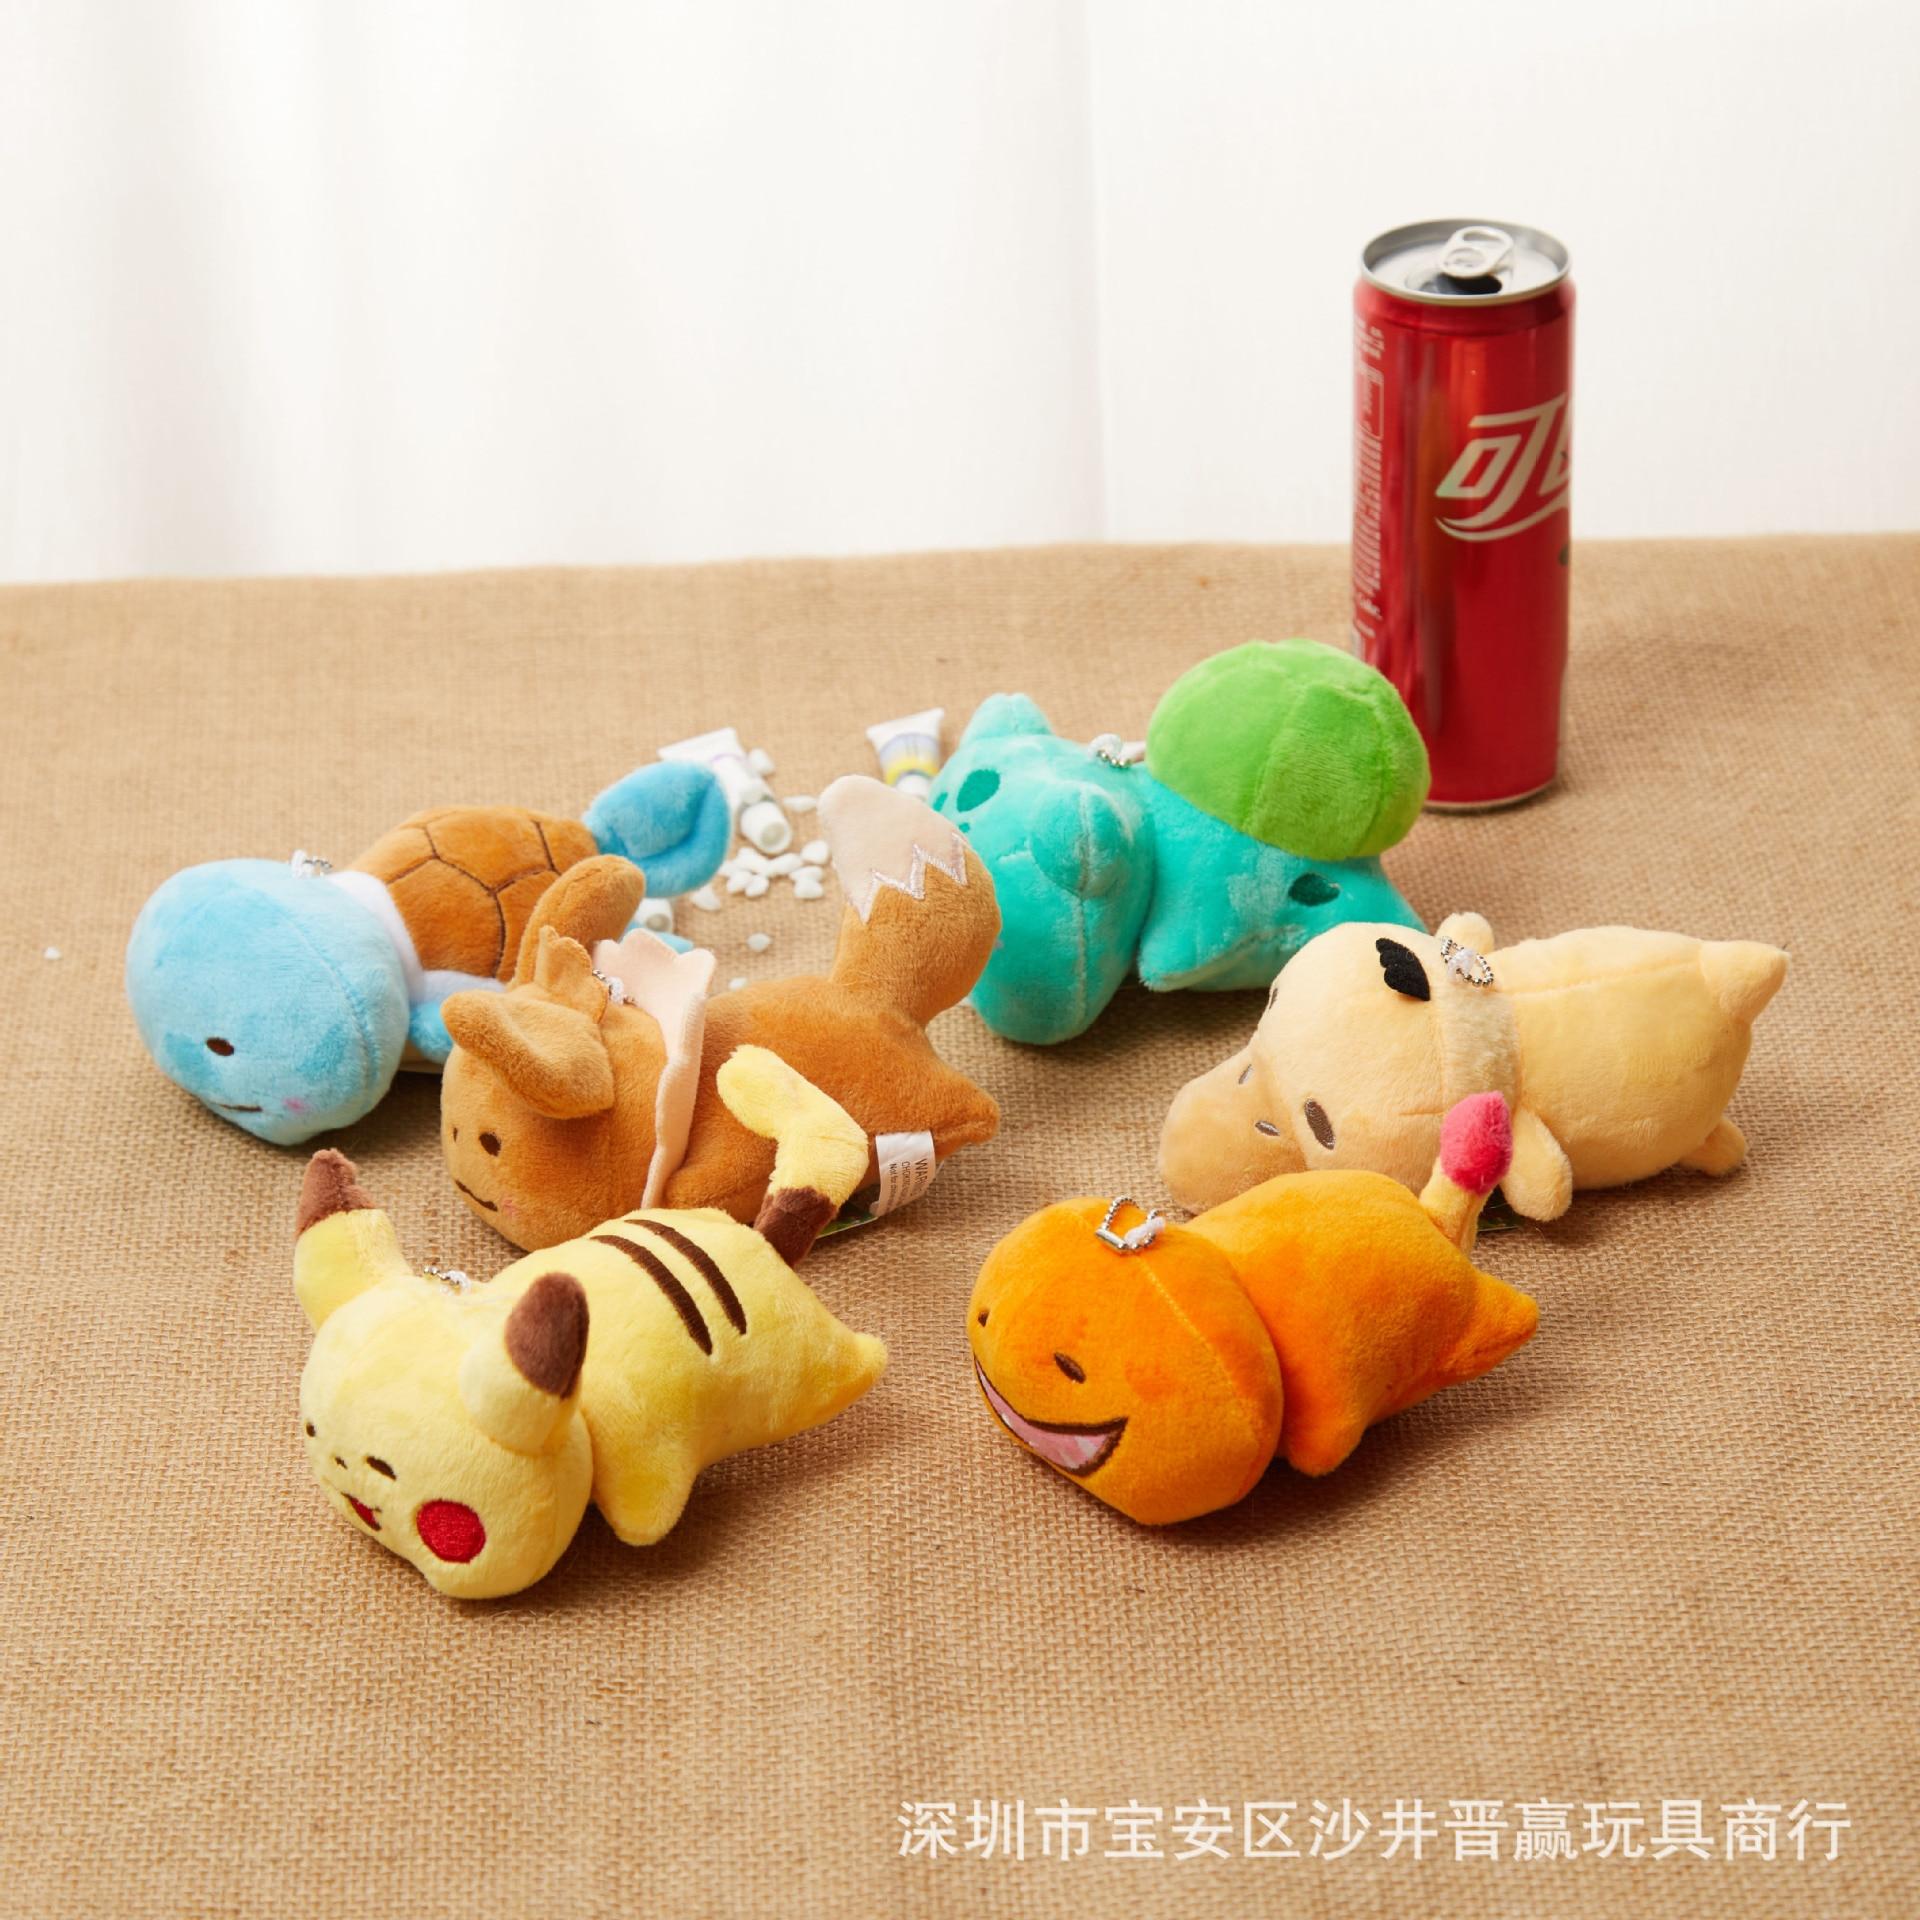 Pokemon 12cm Pocket Monster Keychain Pendant Pikachu Charmander Squirtle Bulbasaur Stuffed Plush Dolls Toy Gift Kid Children